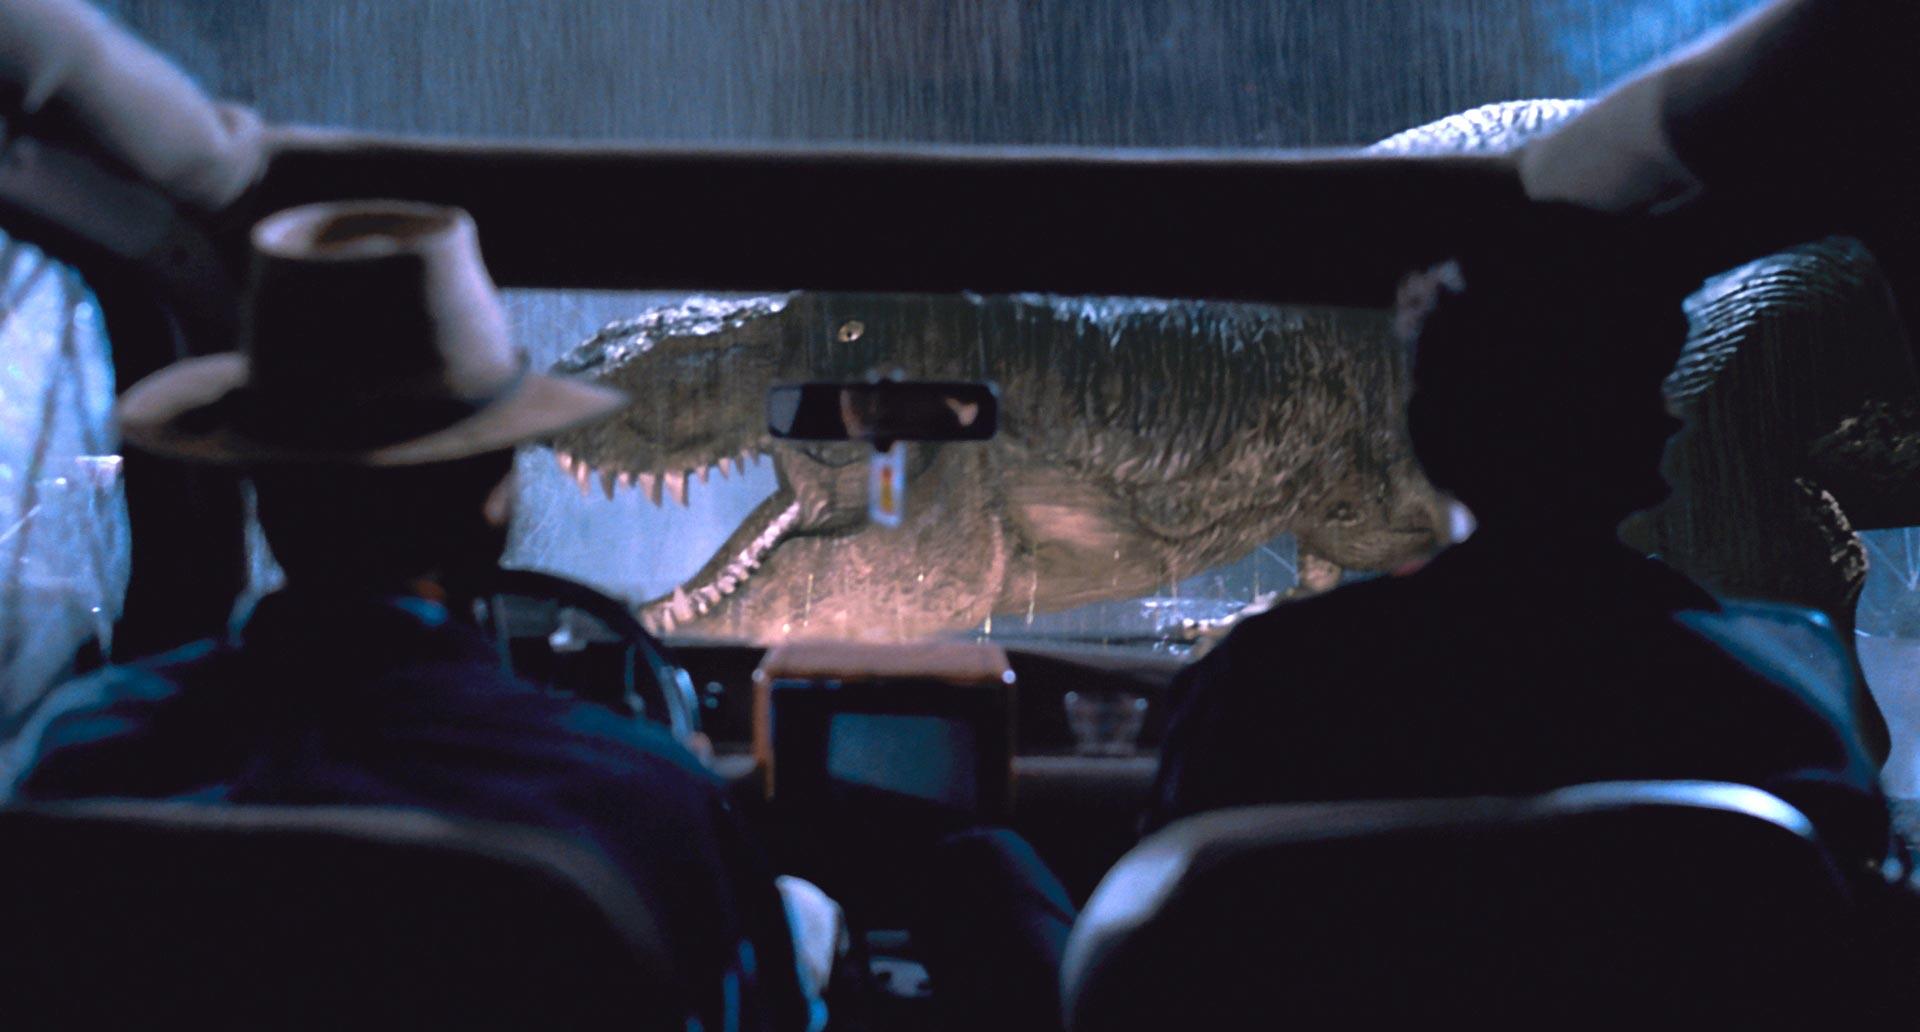 http://www.filmofilia.com/wp-content/uploads/2012/11/Jurassic-Park-3D_07.jpg